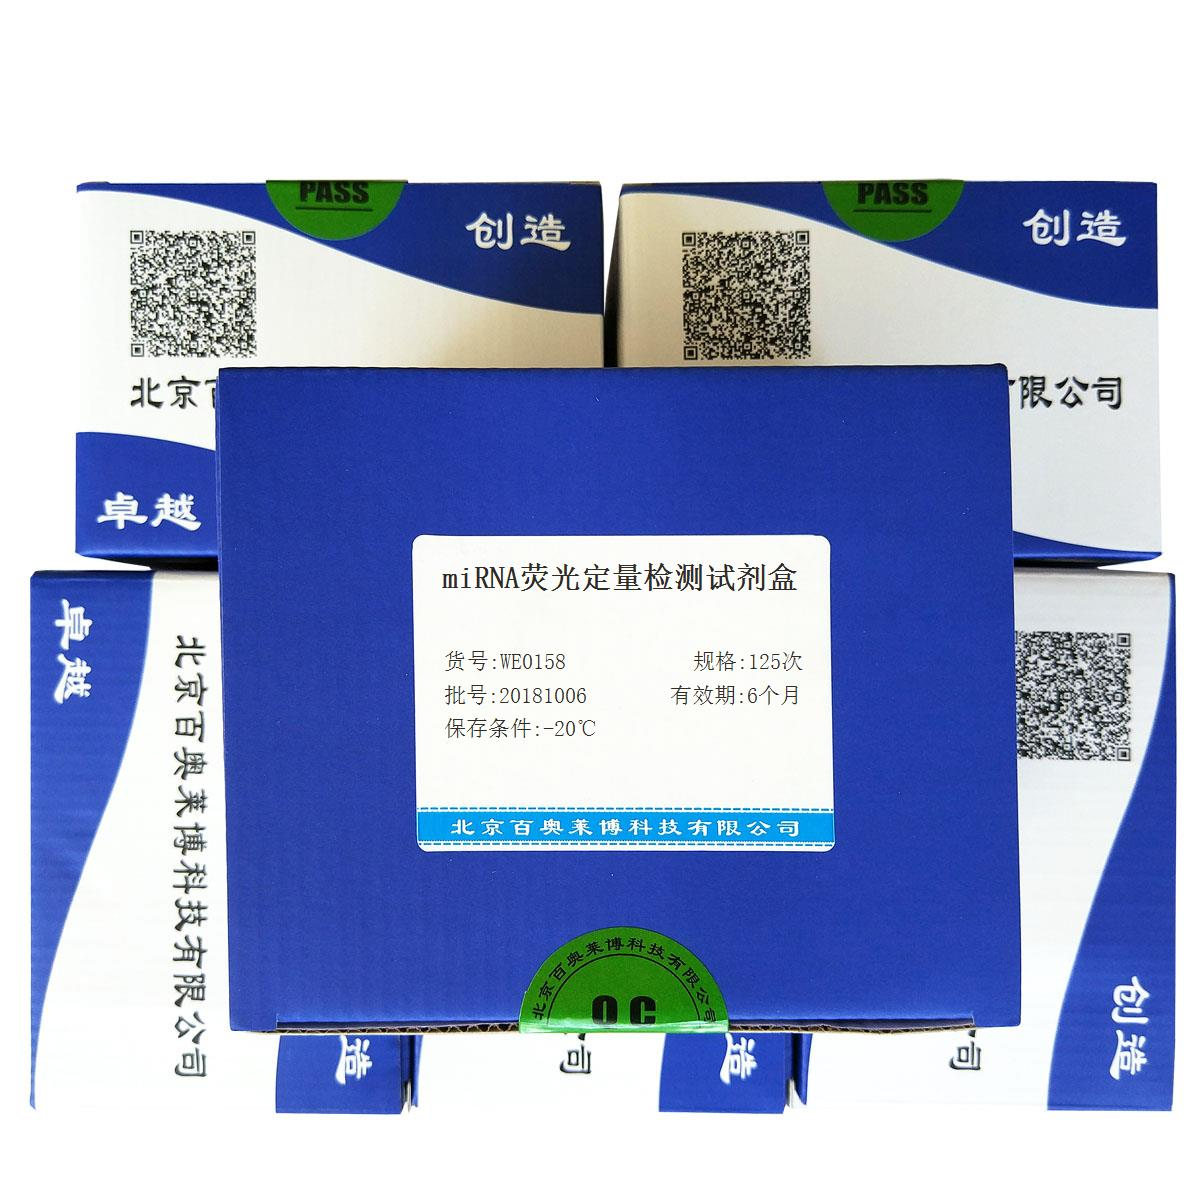 miRNA荧光定量检测试剂盒